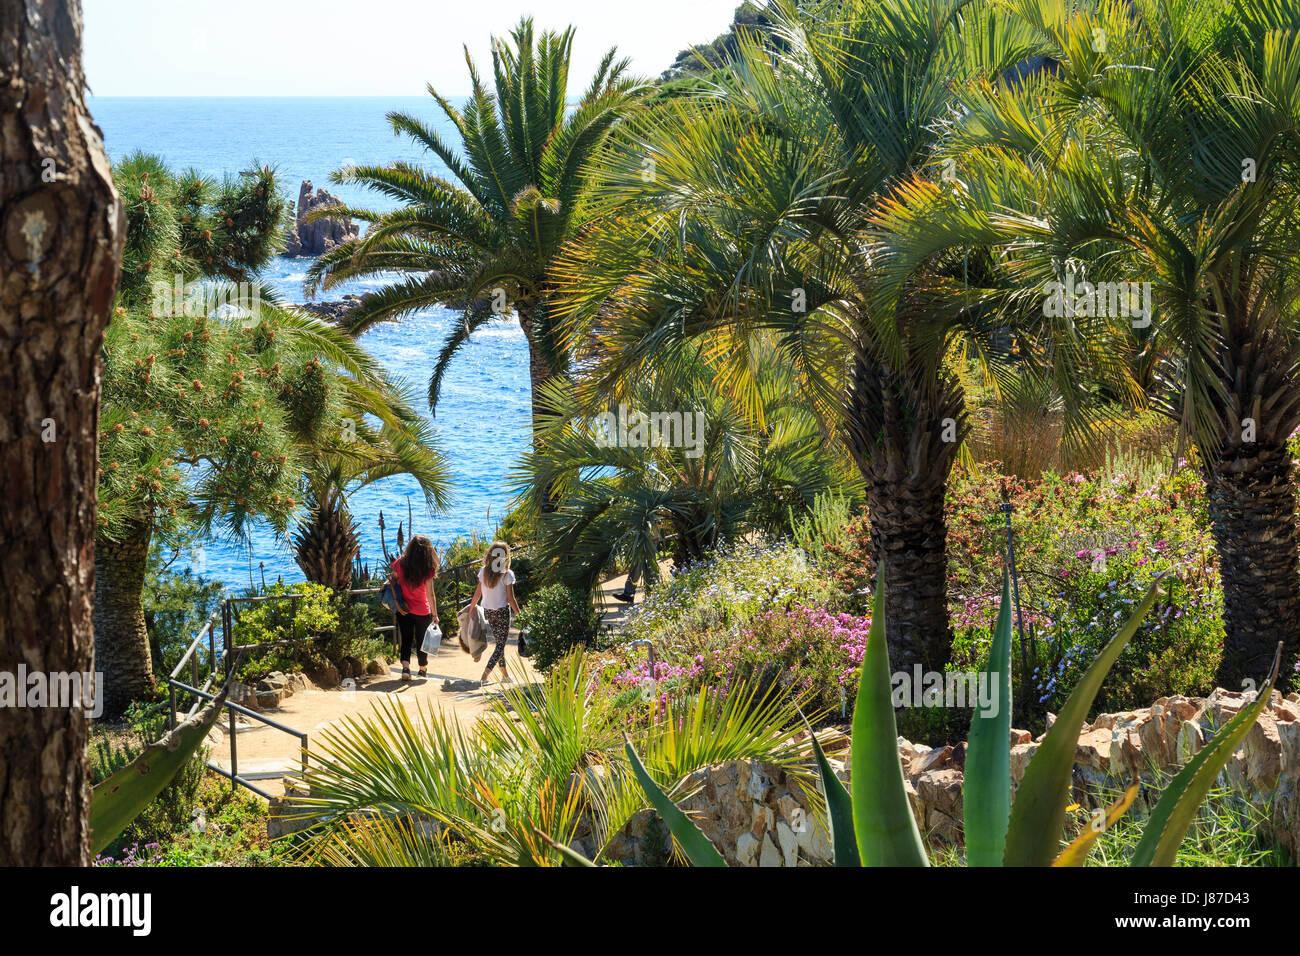 Espagne catalogne costa brava blanes jardin botanique marimurtra spain catalonia costa brava blanes marimurtra botanical garden